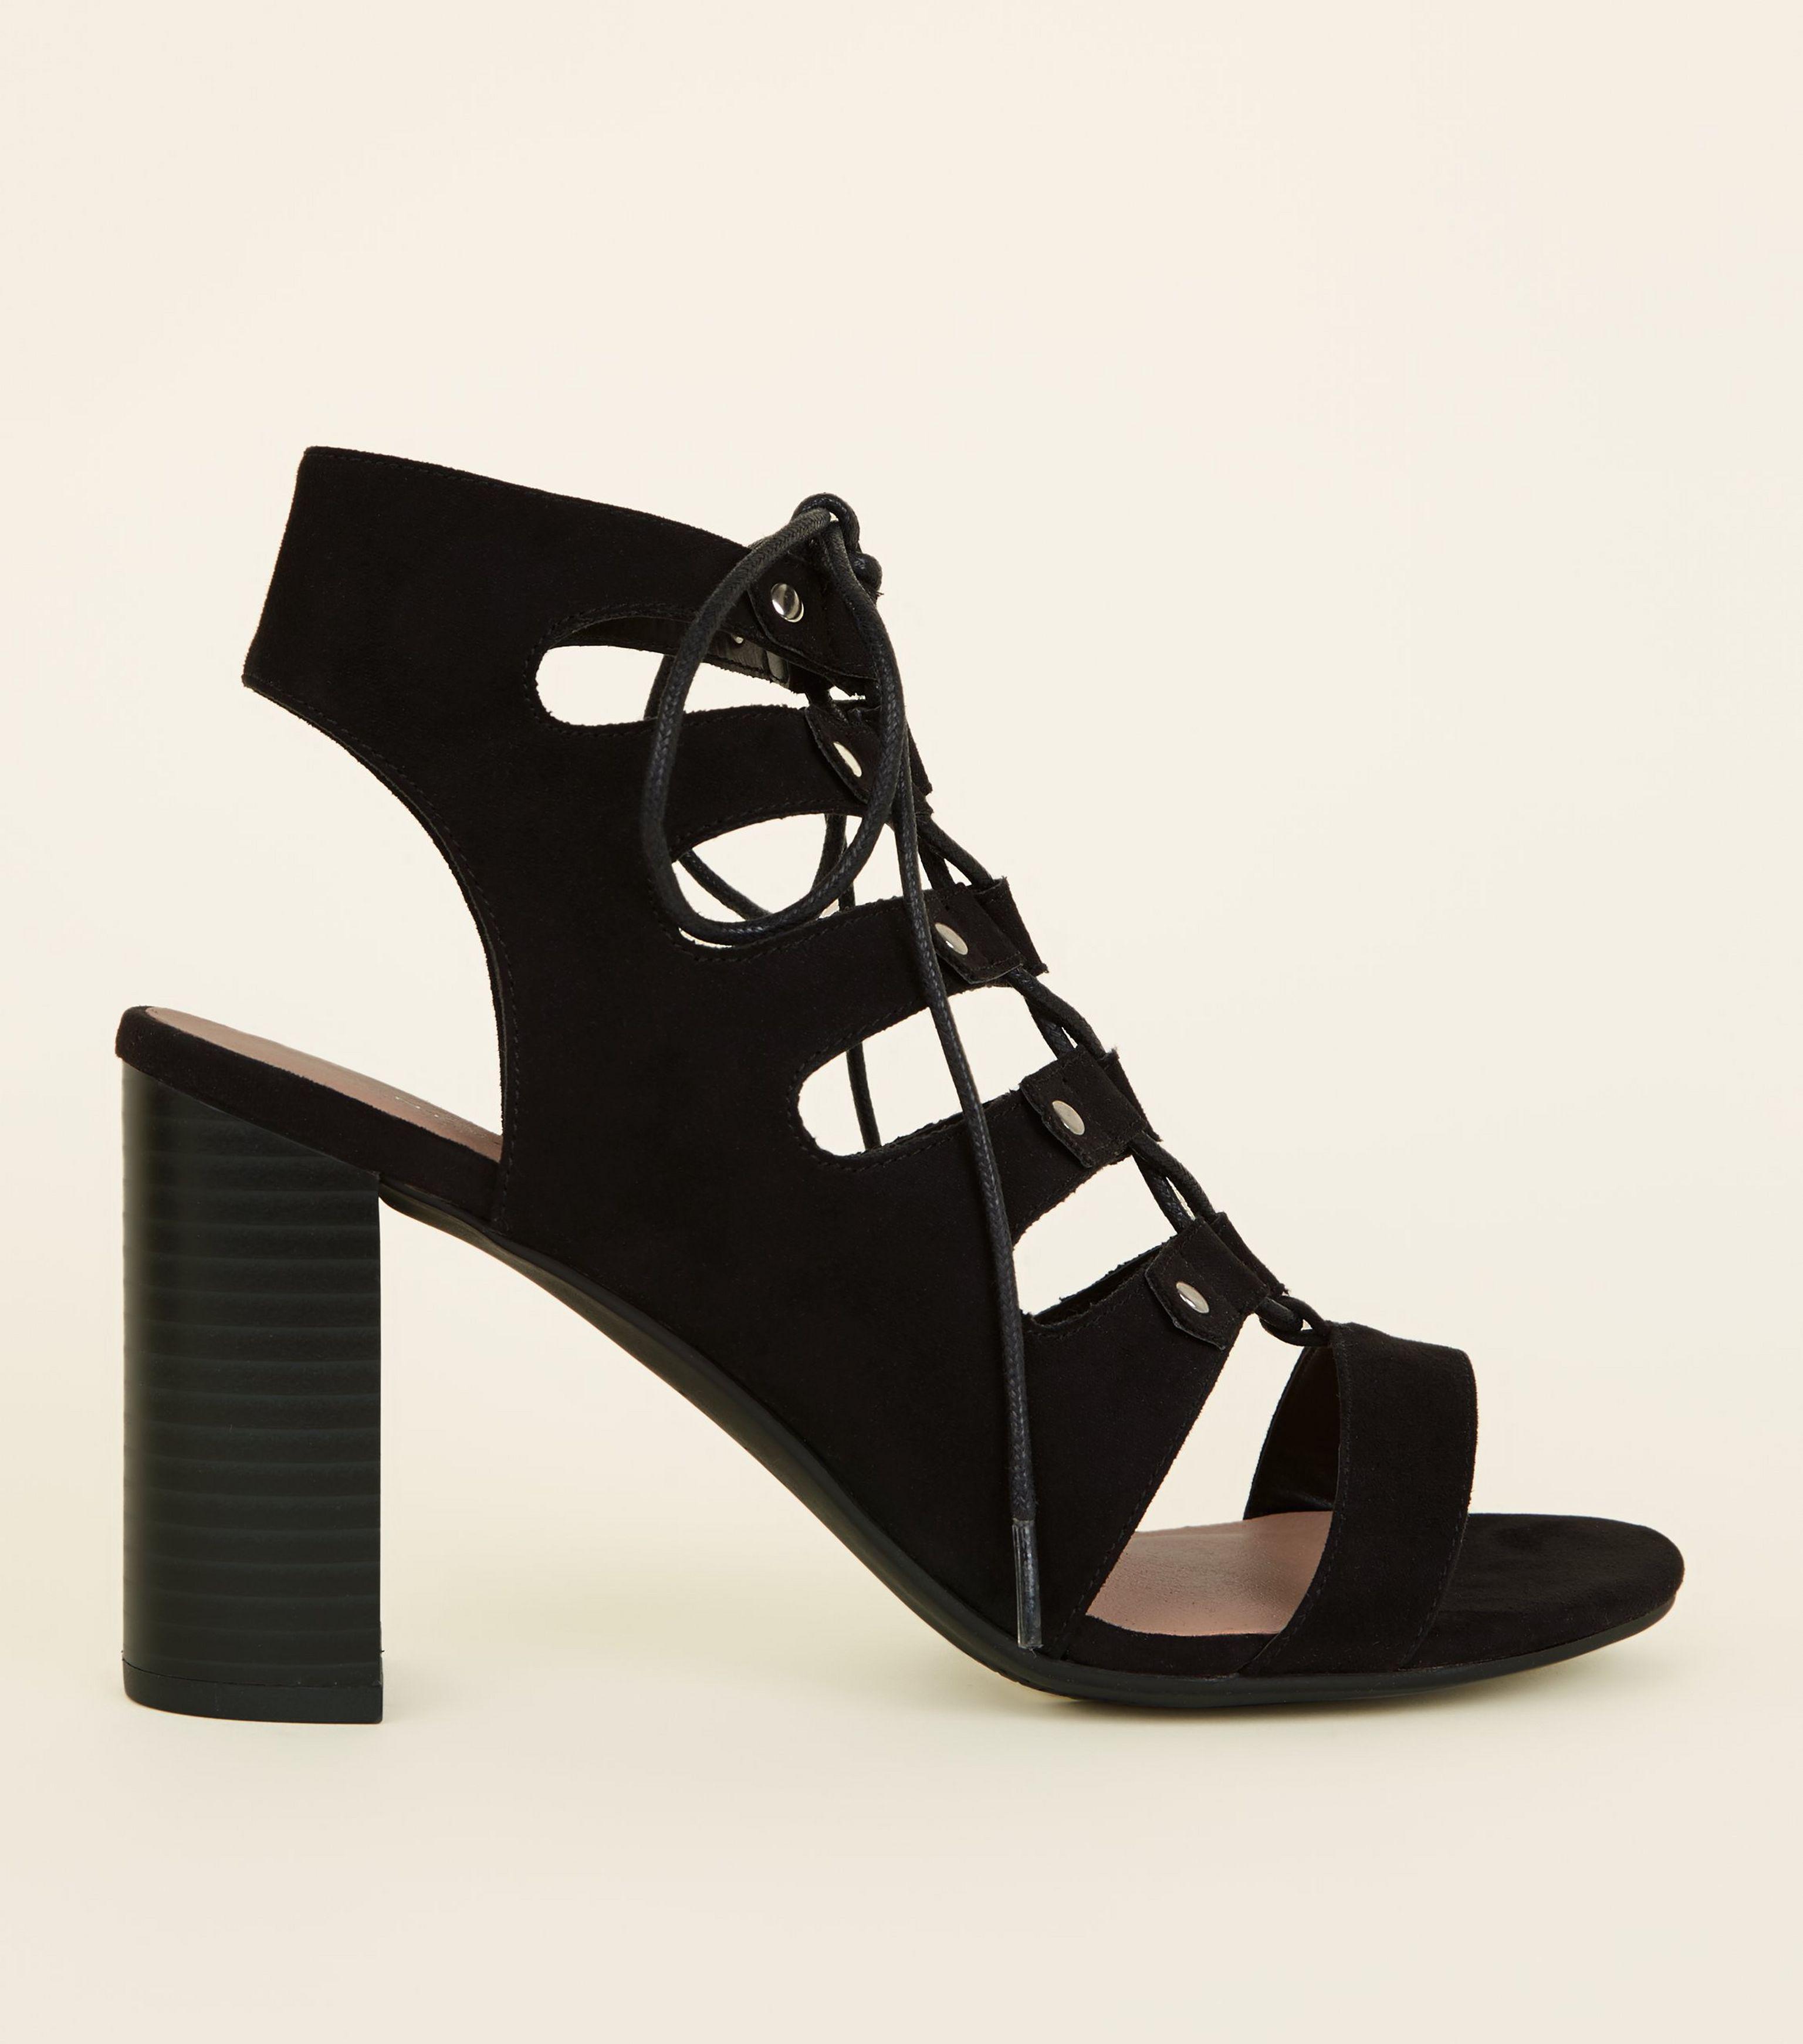 3bfd400c326e New Look Wide Fit Black Suedette Block Heel Ghillie Sandals in Black ...